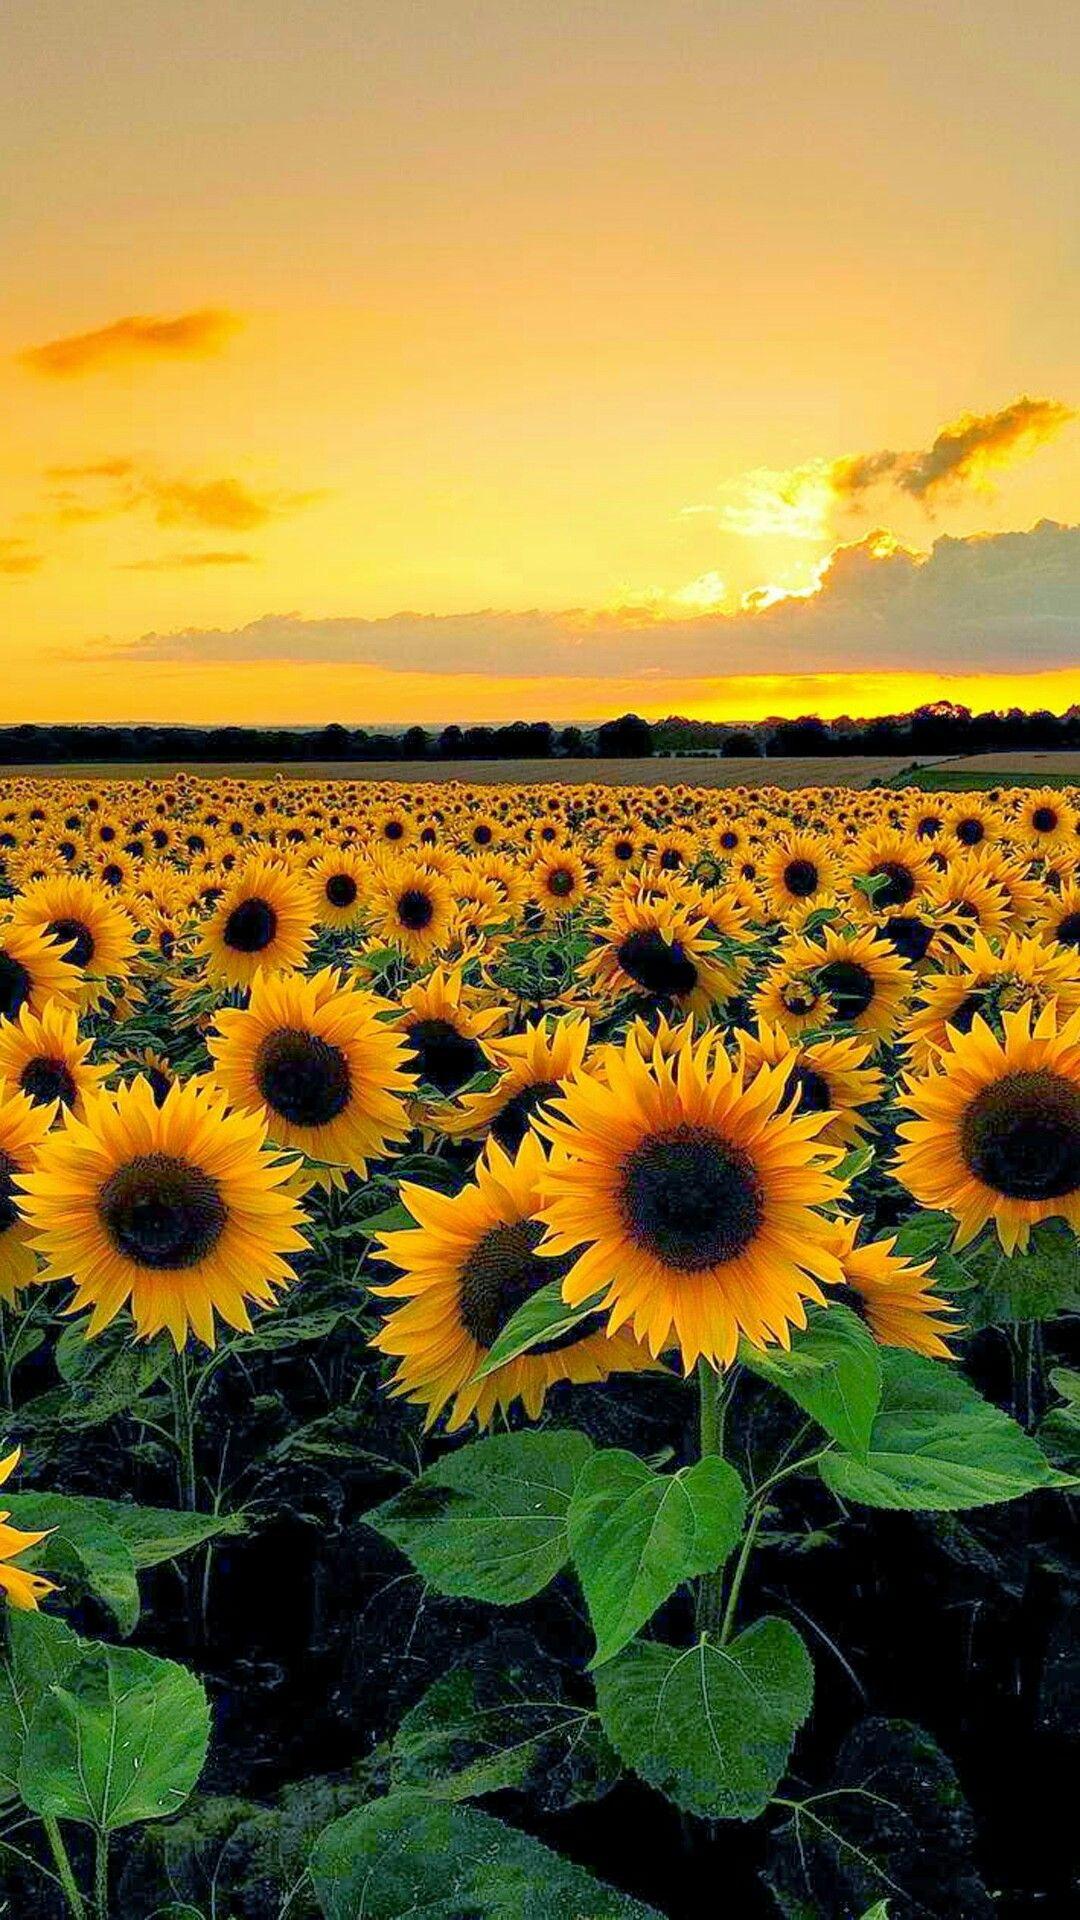 Bunga Matahari Sangat Cantek Kembang Di Waktu Pagi Song By